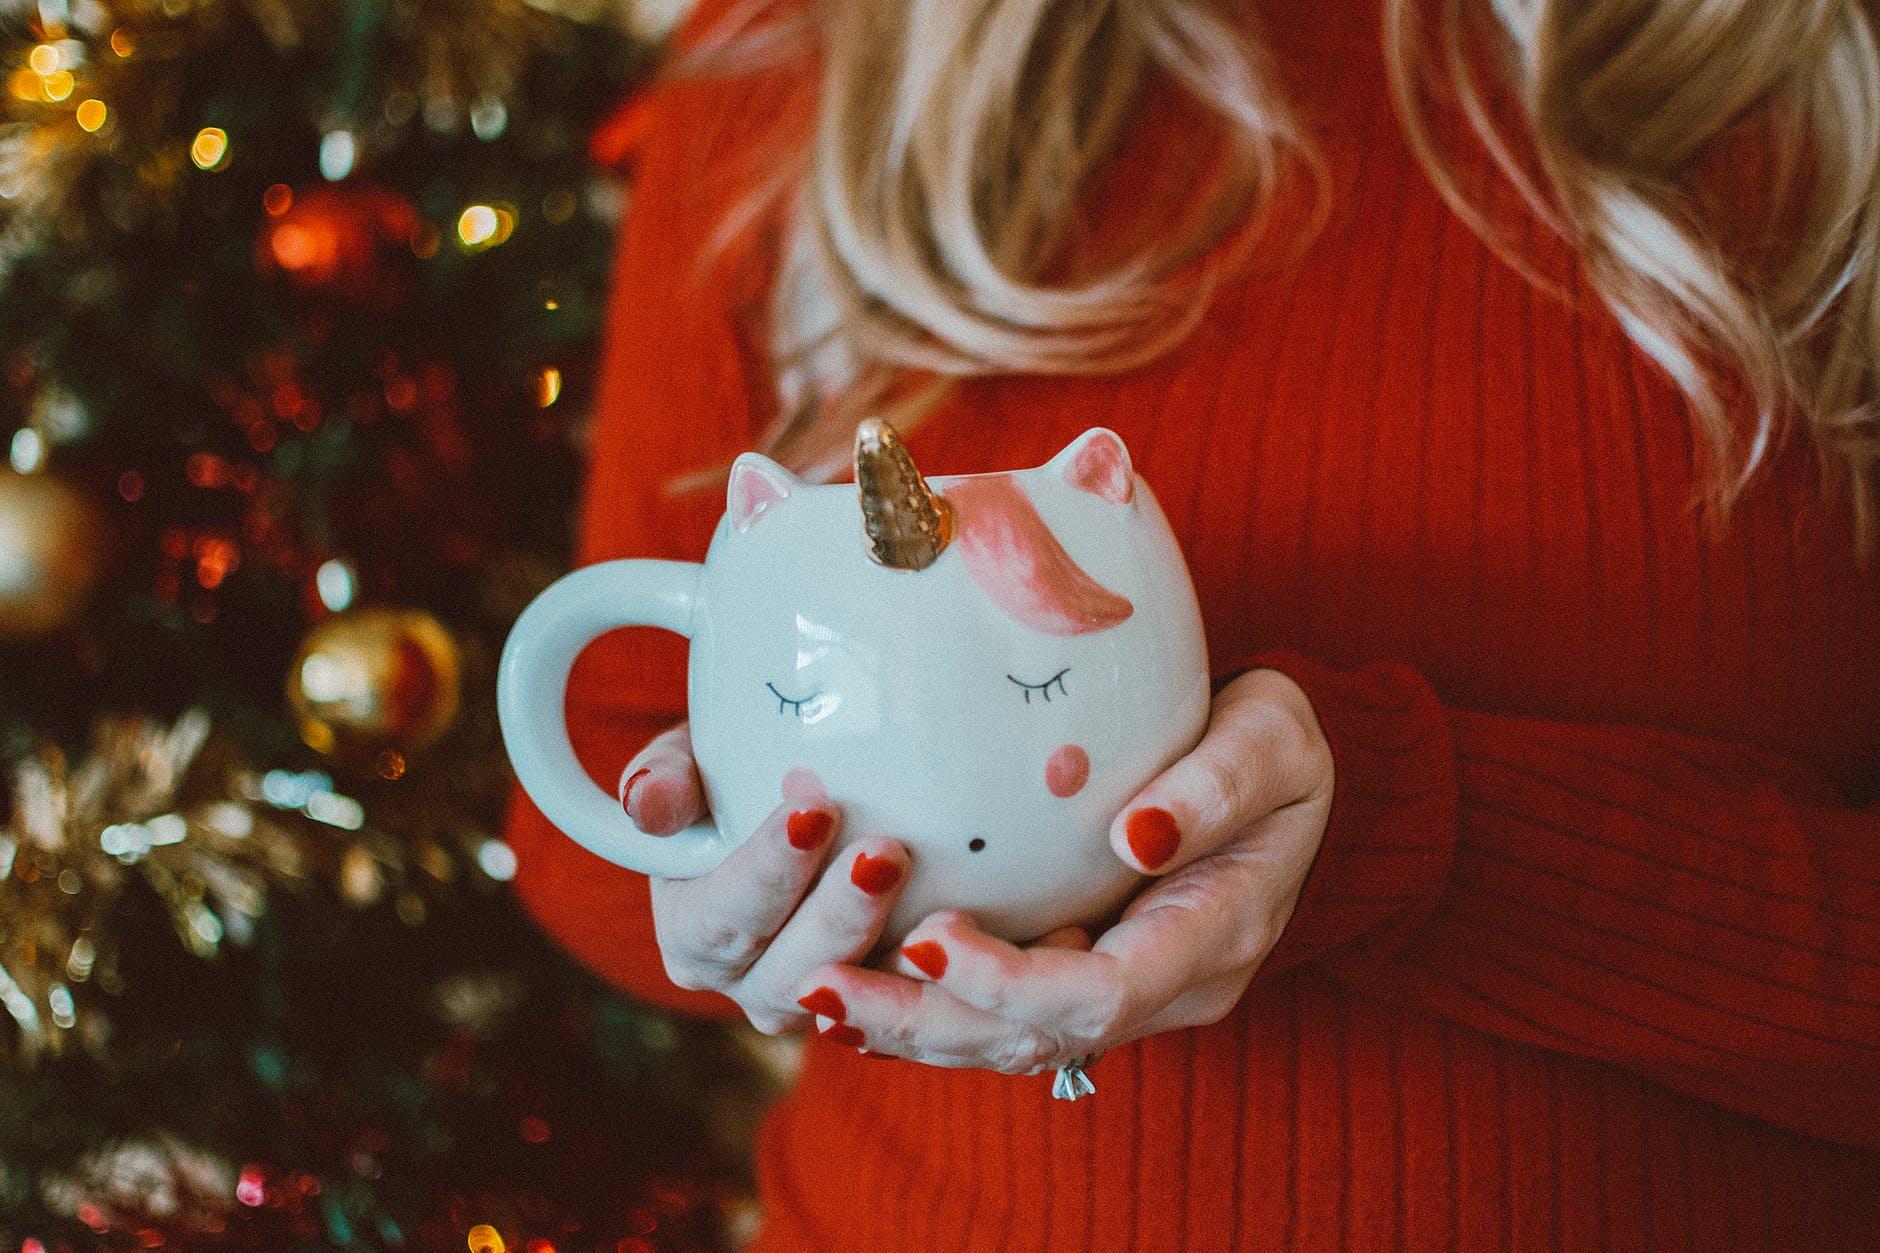 Dragi Božiću gdje si se sakrio?